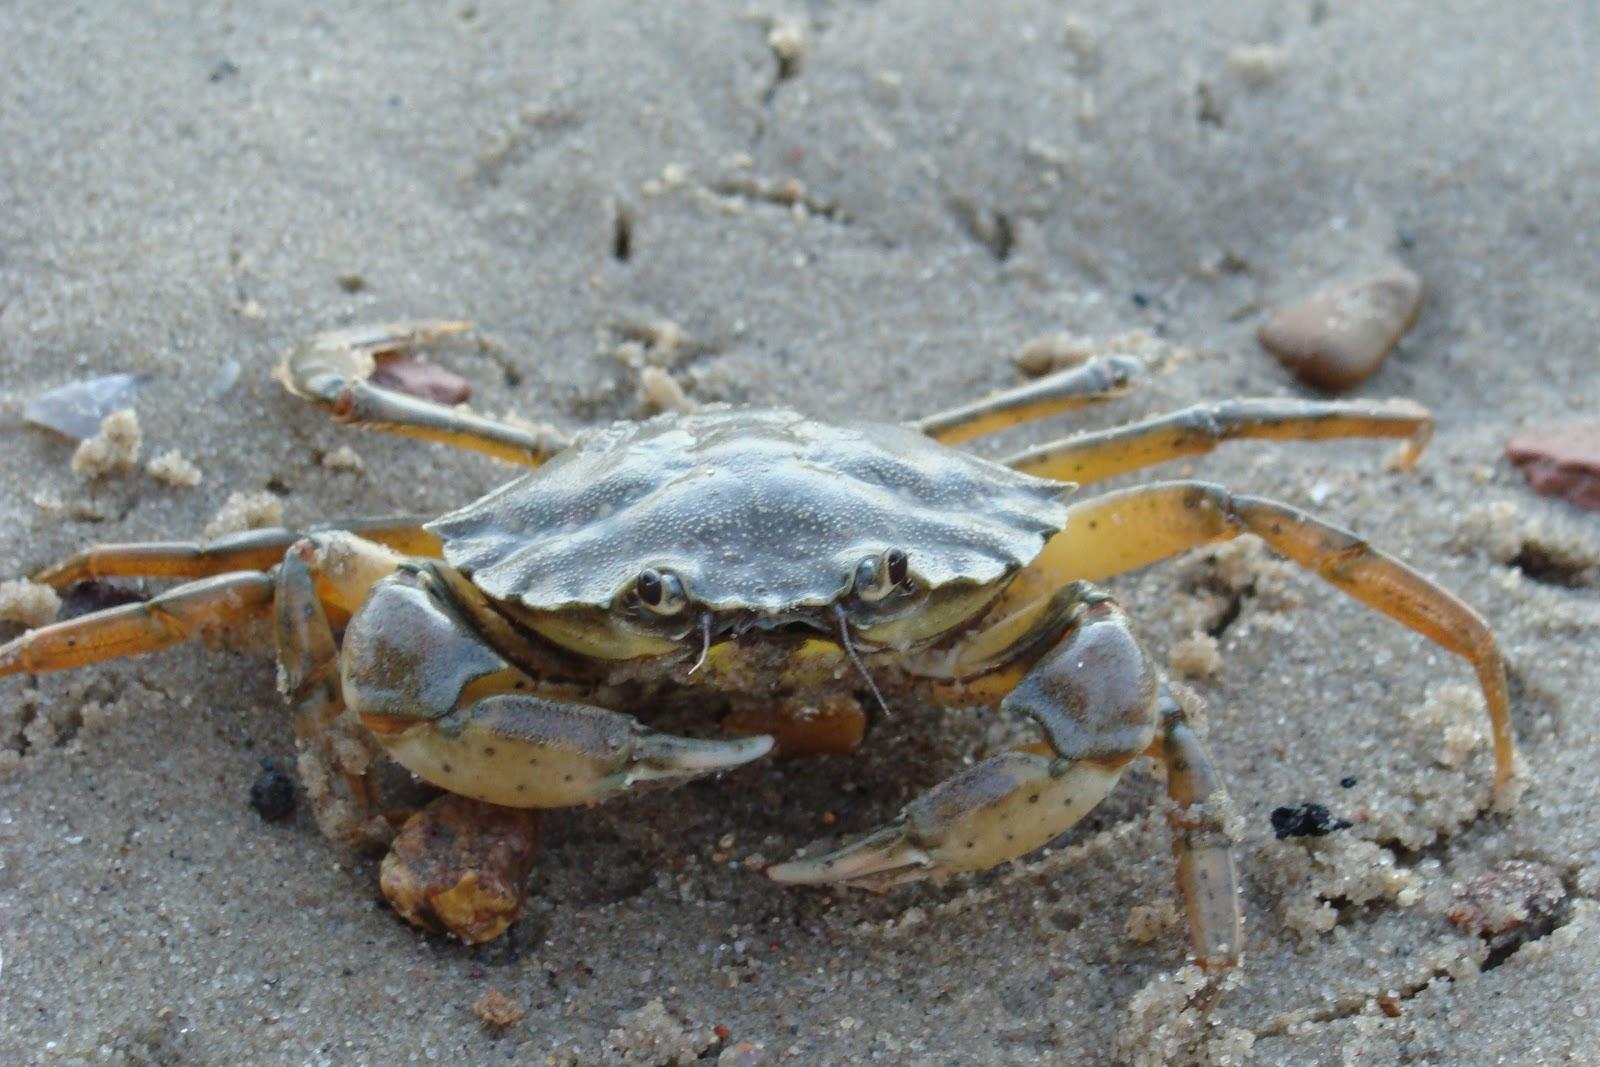 https://upload.wikimedia.org/wikipedia/commons/6/60/Common_shore_crab_1.JPG